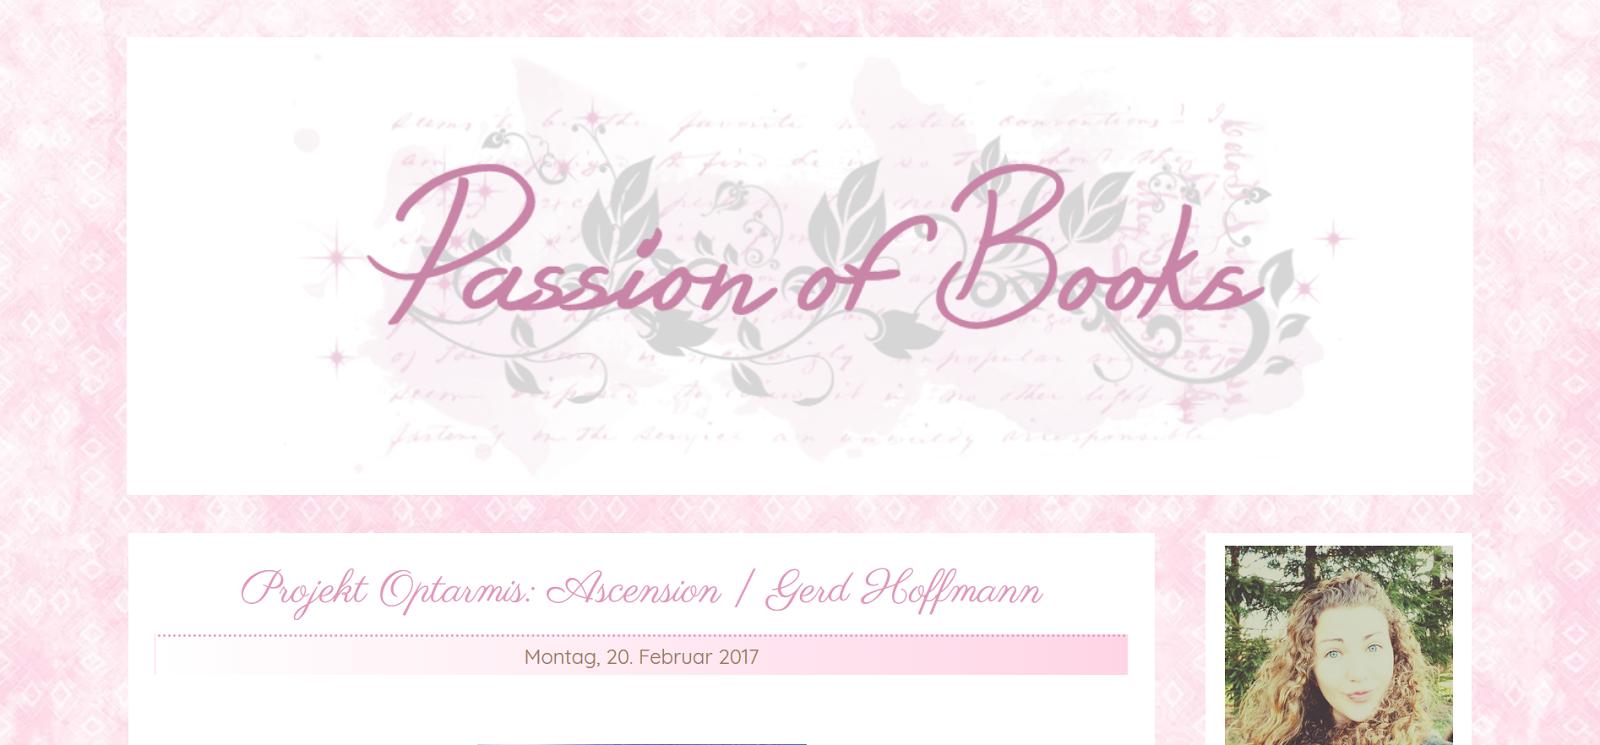 http://mypassionofbooks.blogspot.de/